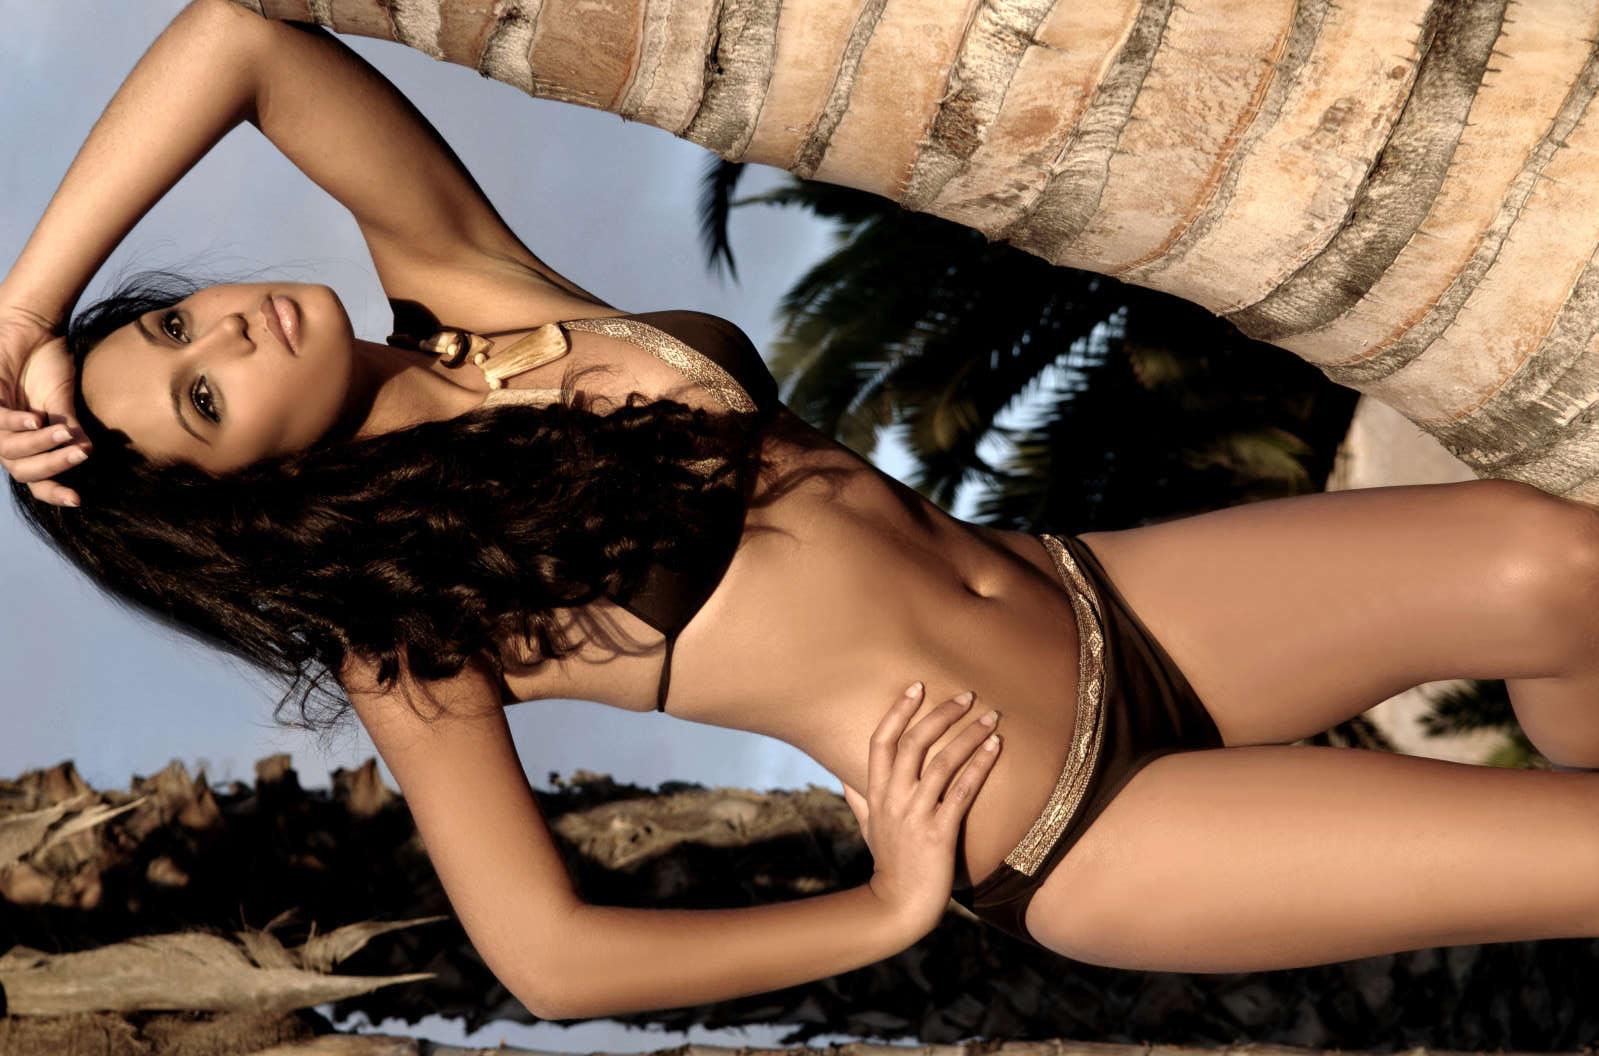 patricia yurena rodriguez, miss espana 2008/2013, 1st runner-up de miss universe 2013. 1062fu10